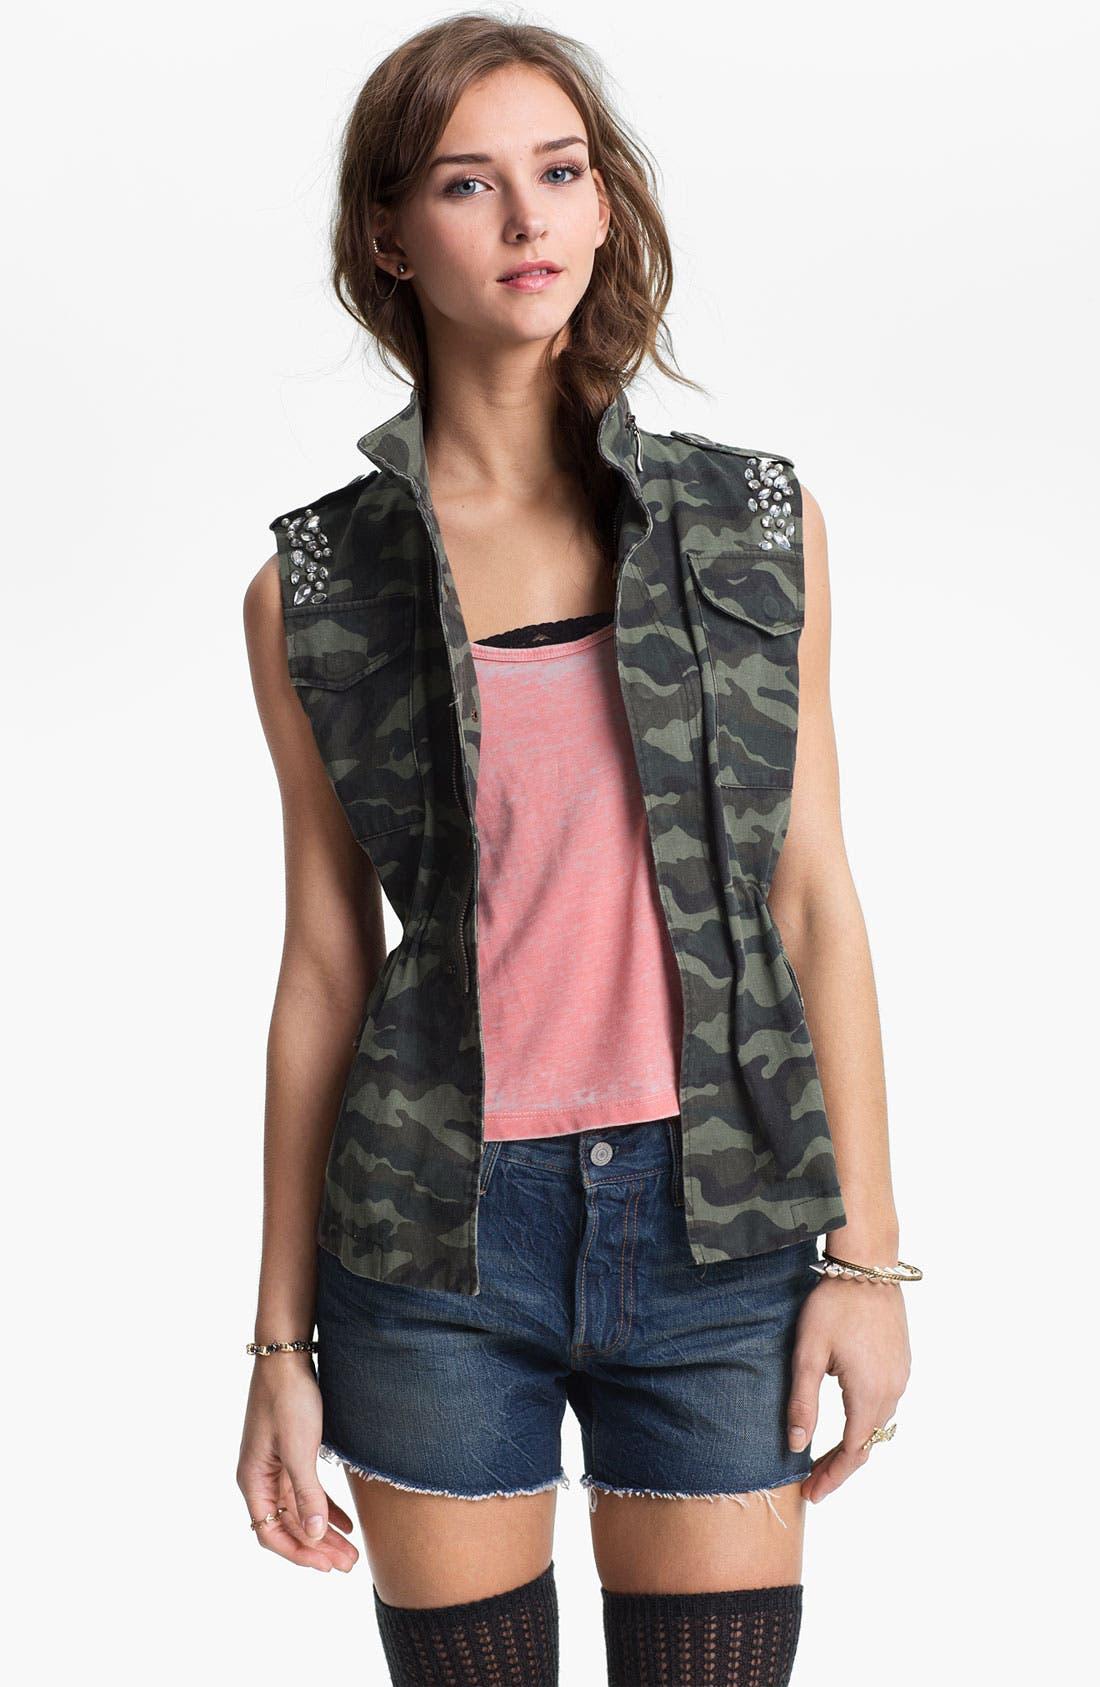 Alternate Image 1 Selected - Jolt Rhinestone Embellished Camo Vest (Juniors)